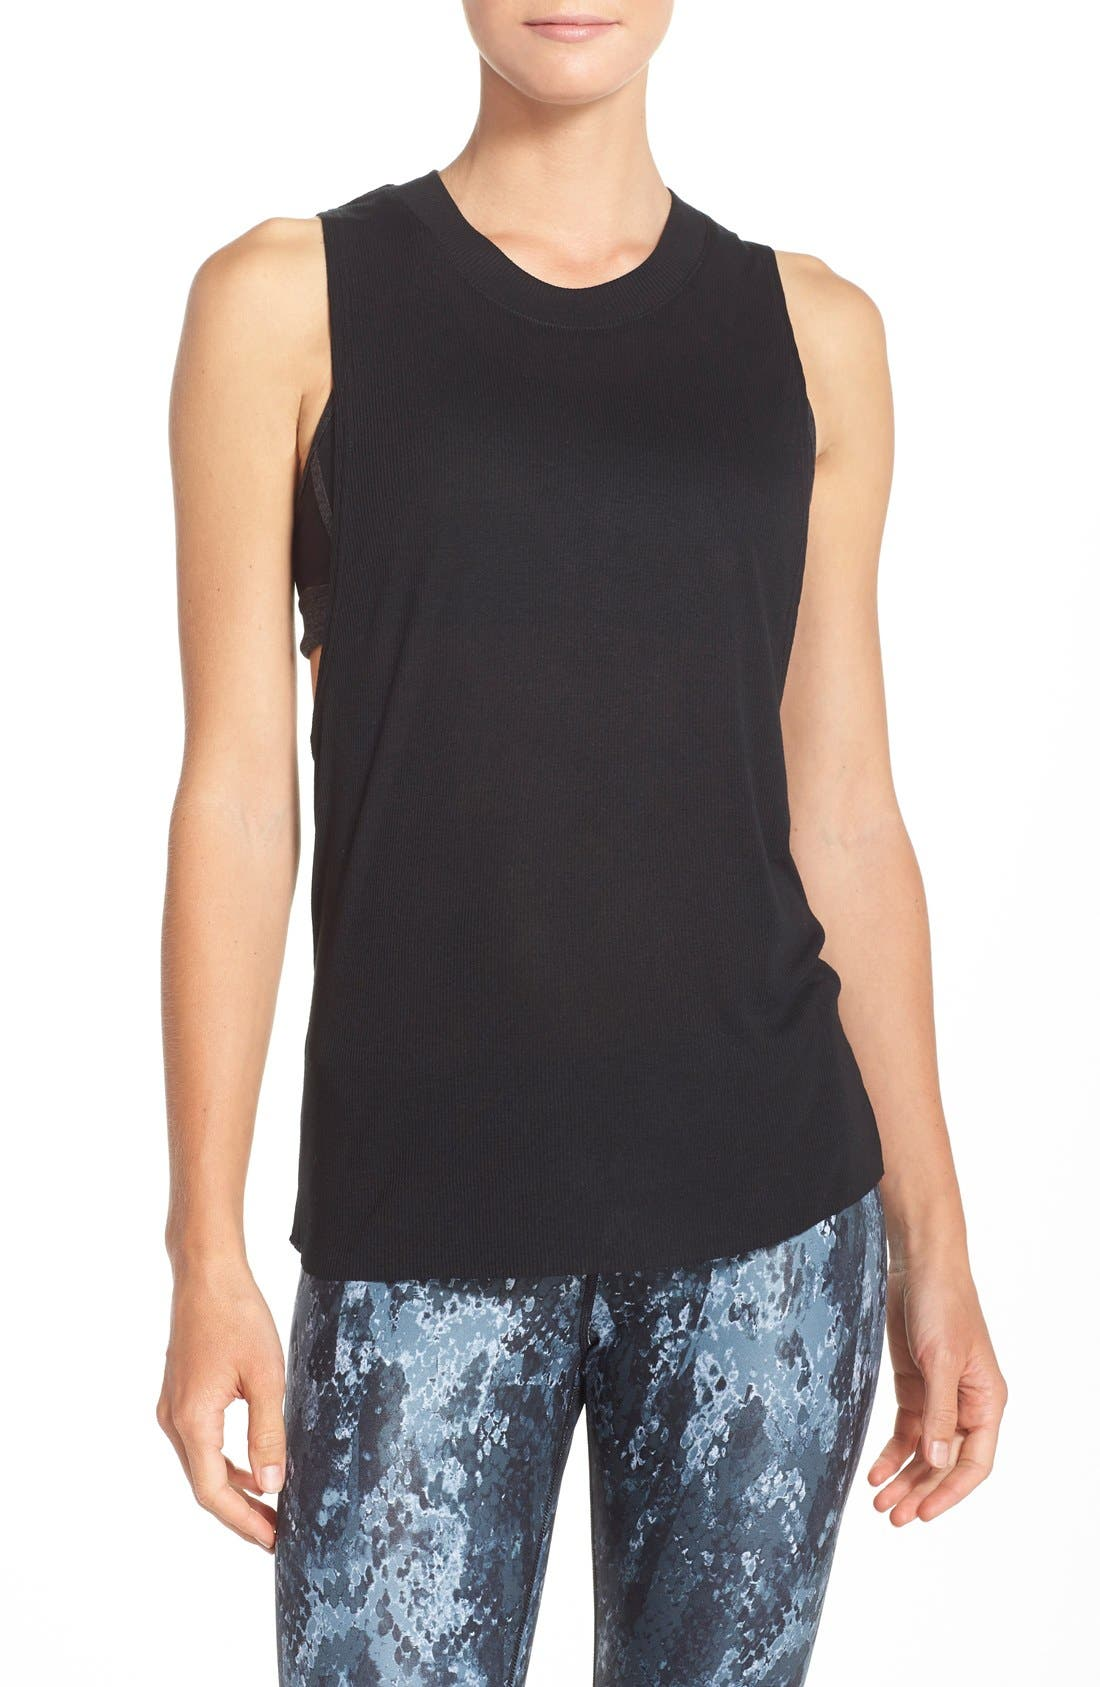 Main Image - Alo Heat Wave Ribbed Muscle Tee